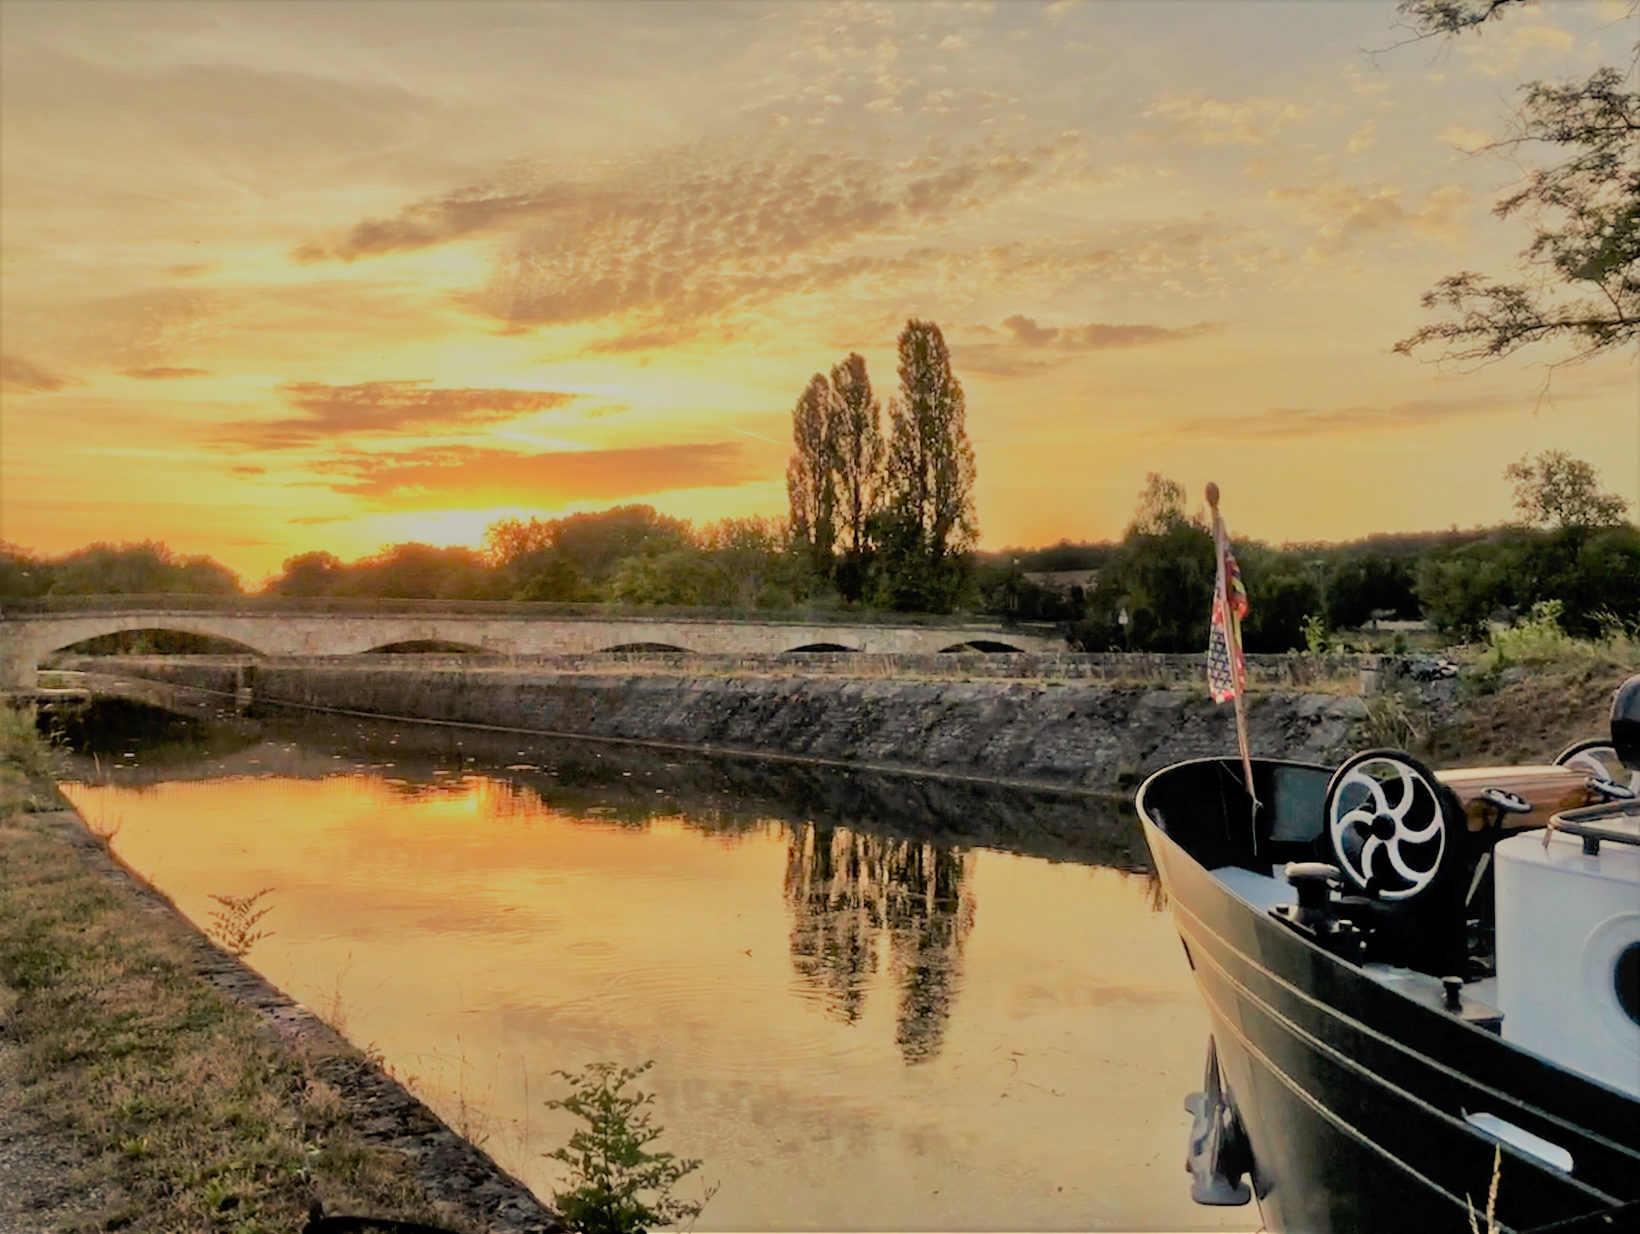 Sunset on the Nivernais